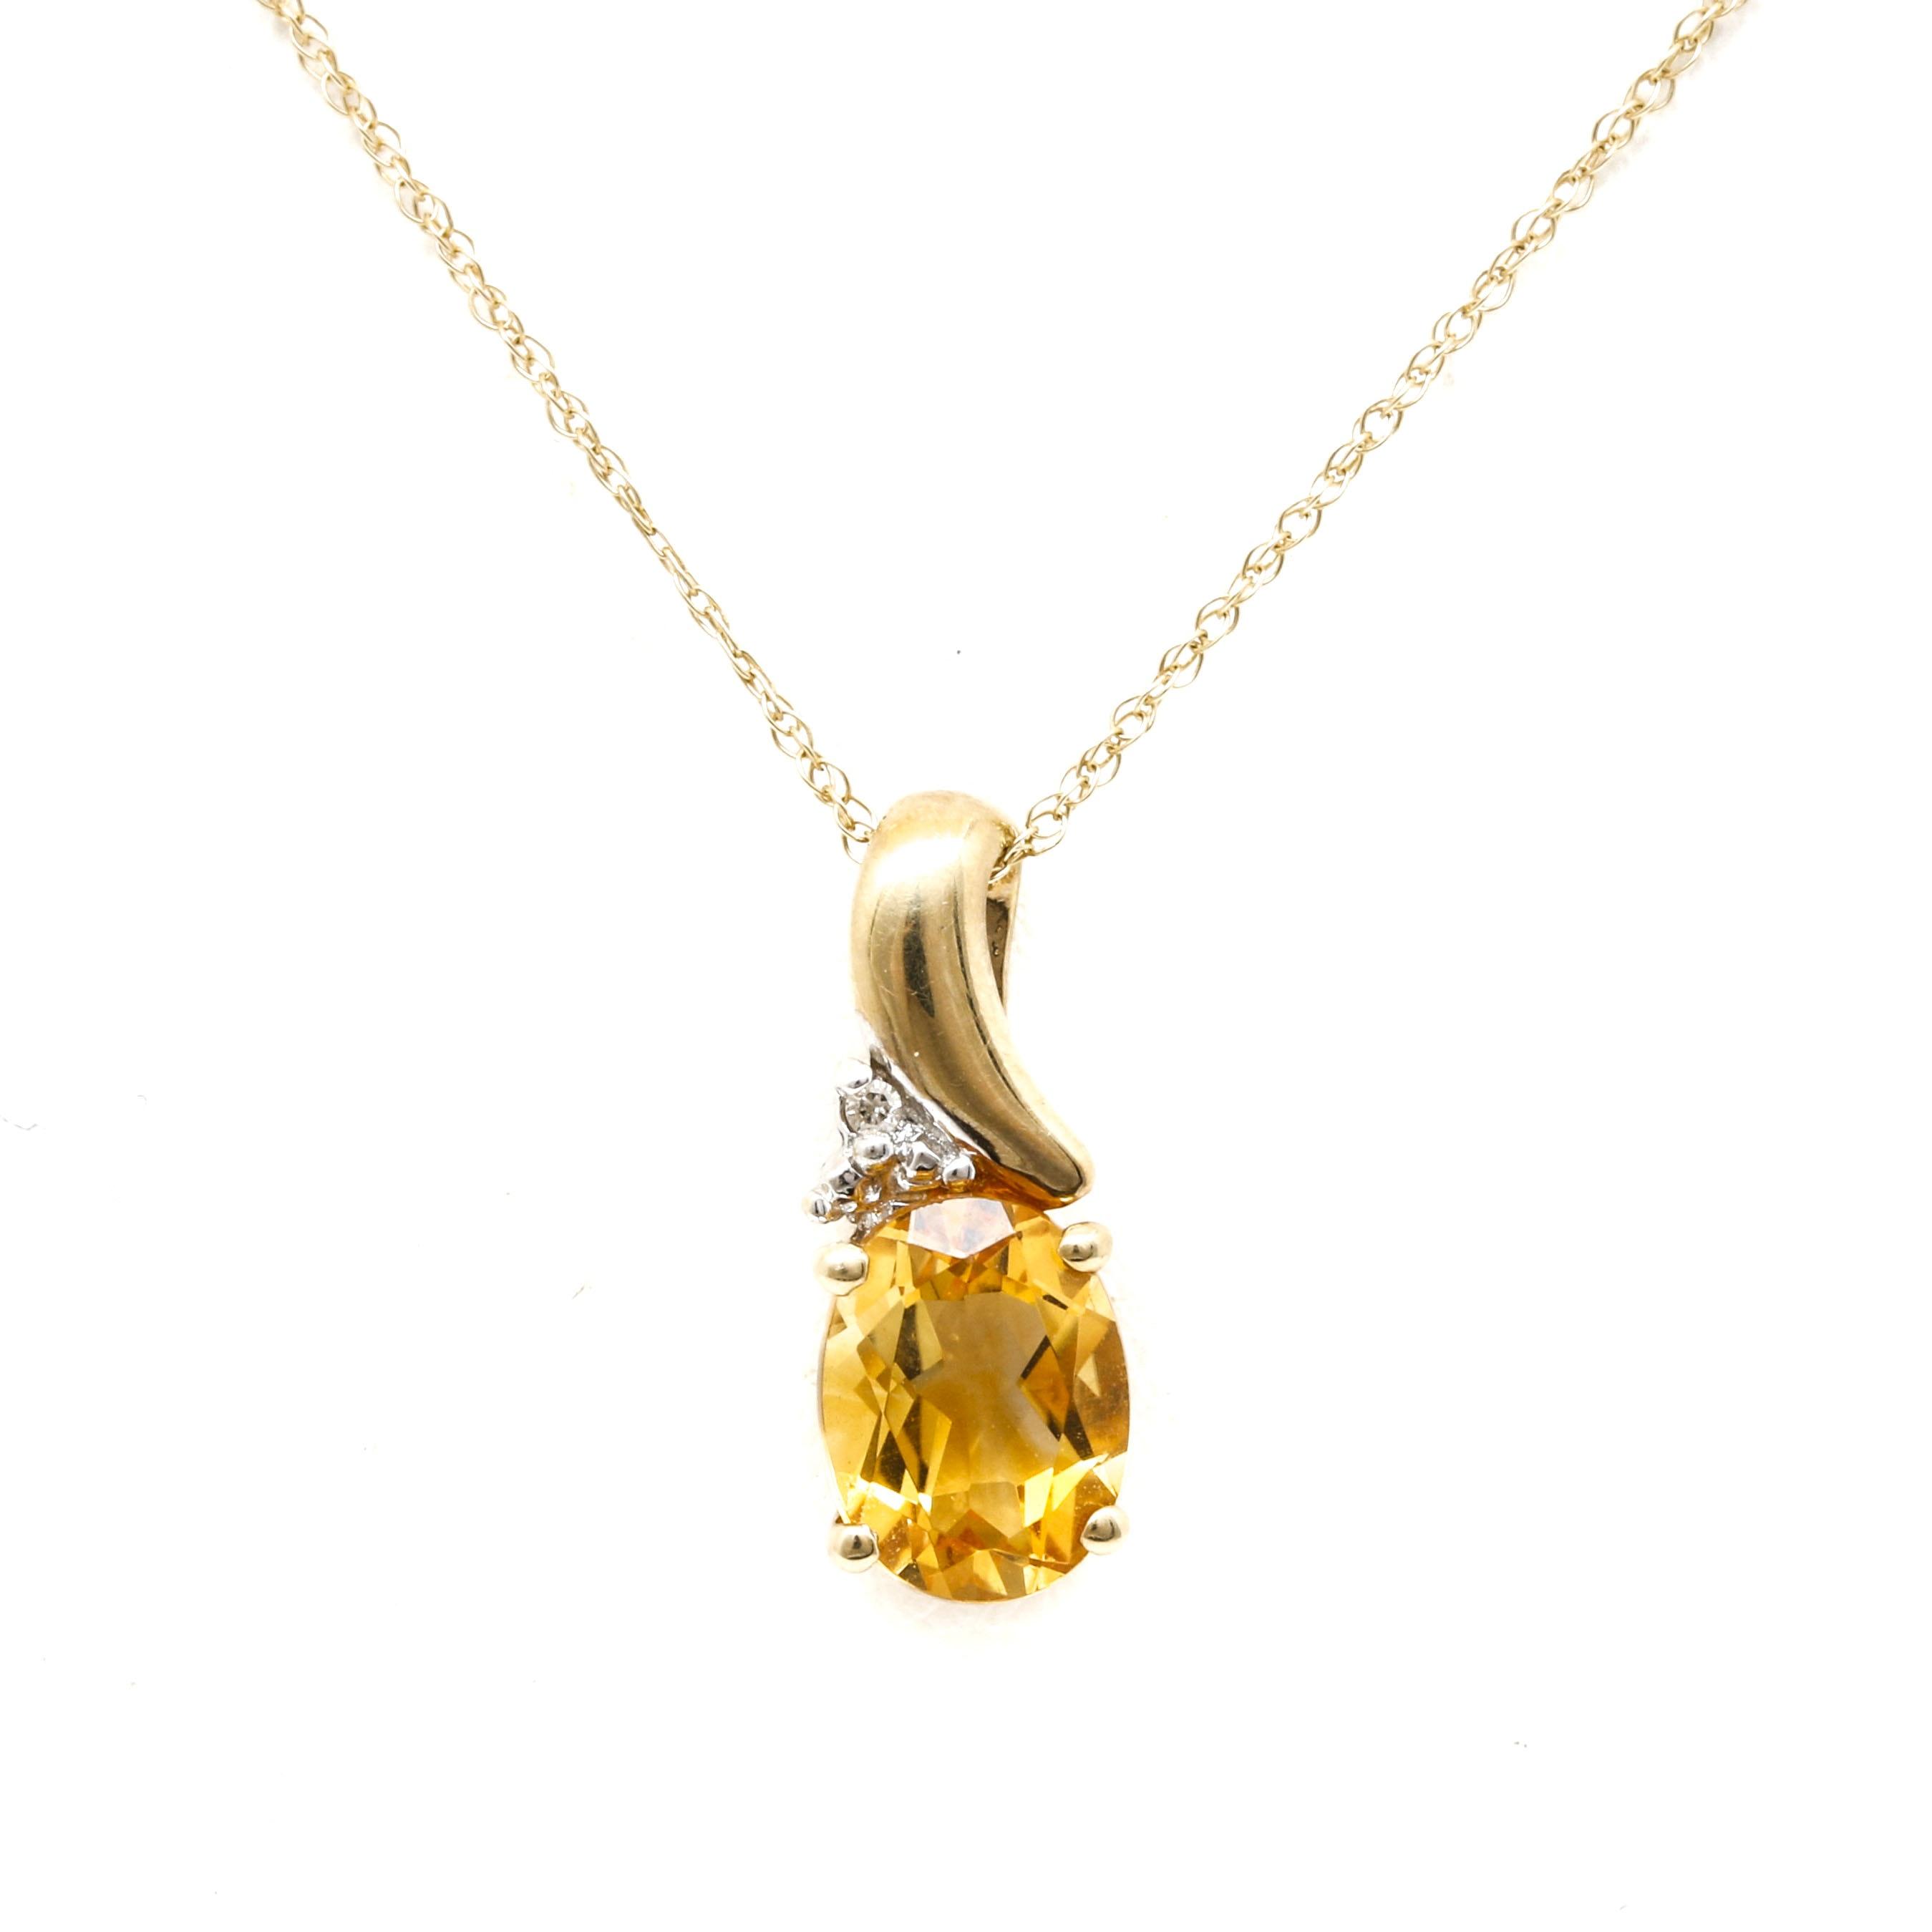 14K Yellow Gold Diamond and Citrine Pendant Necklace